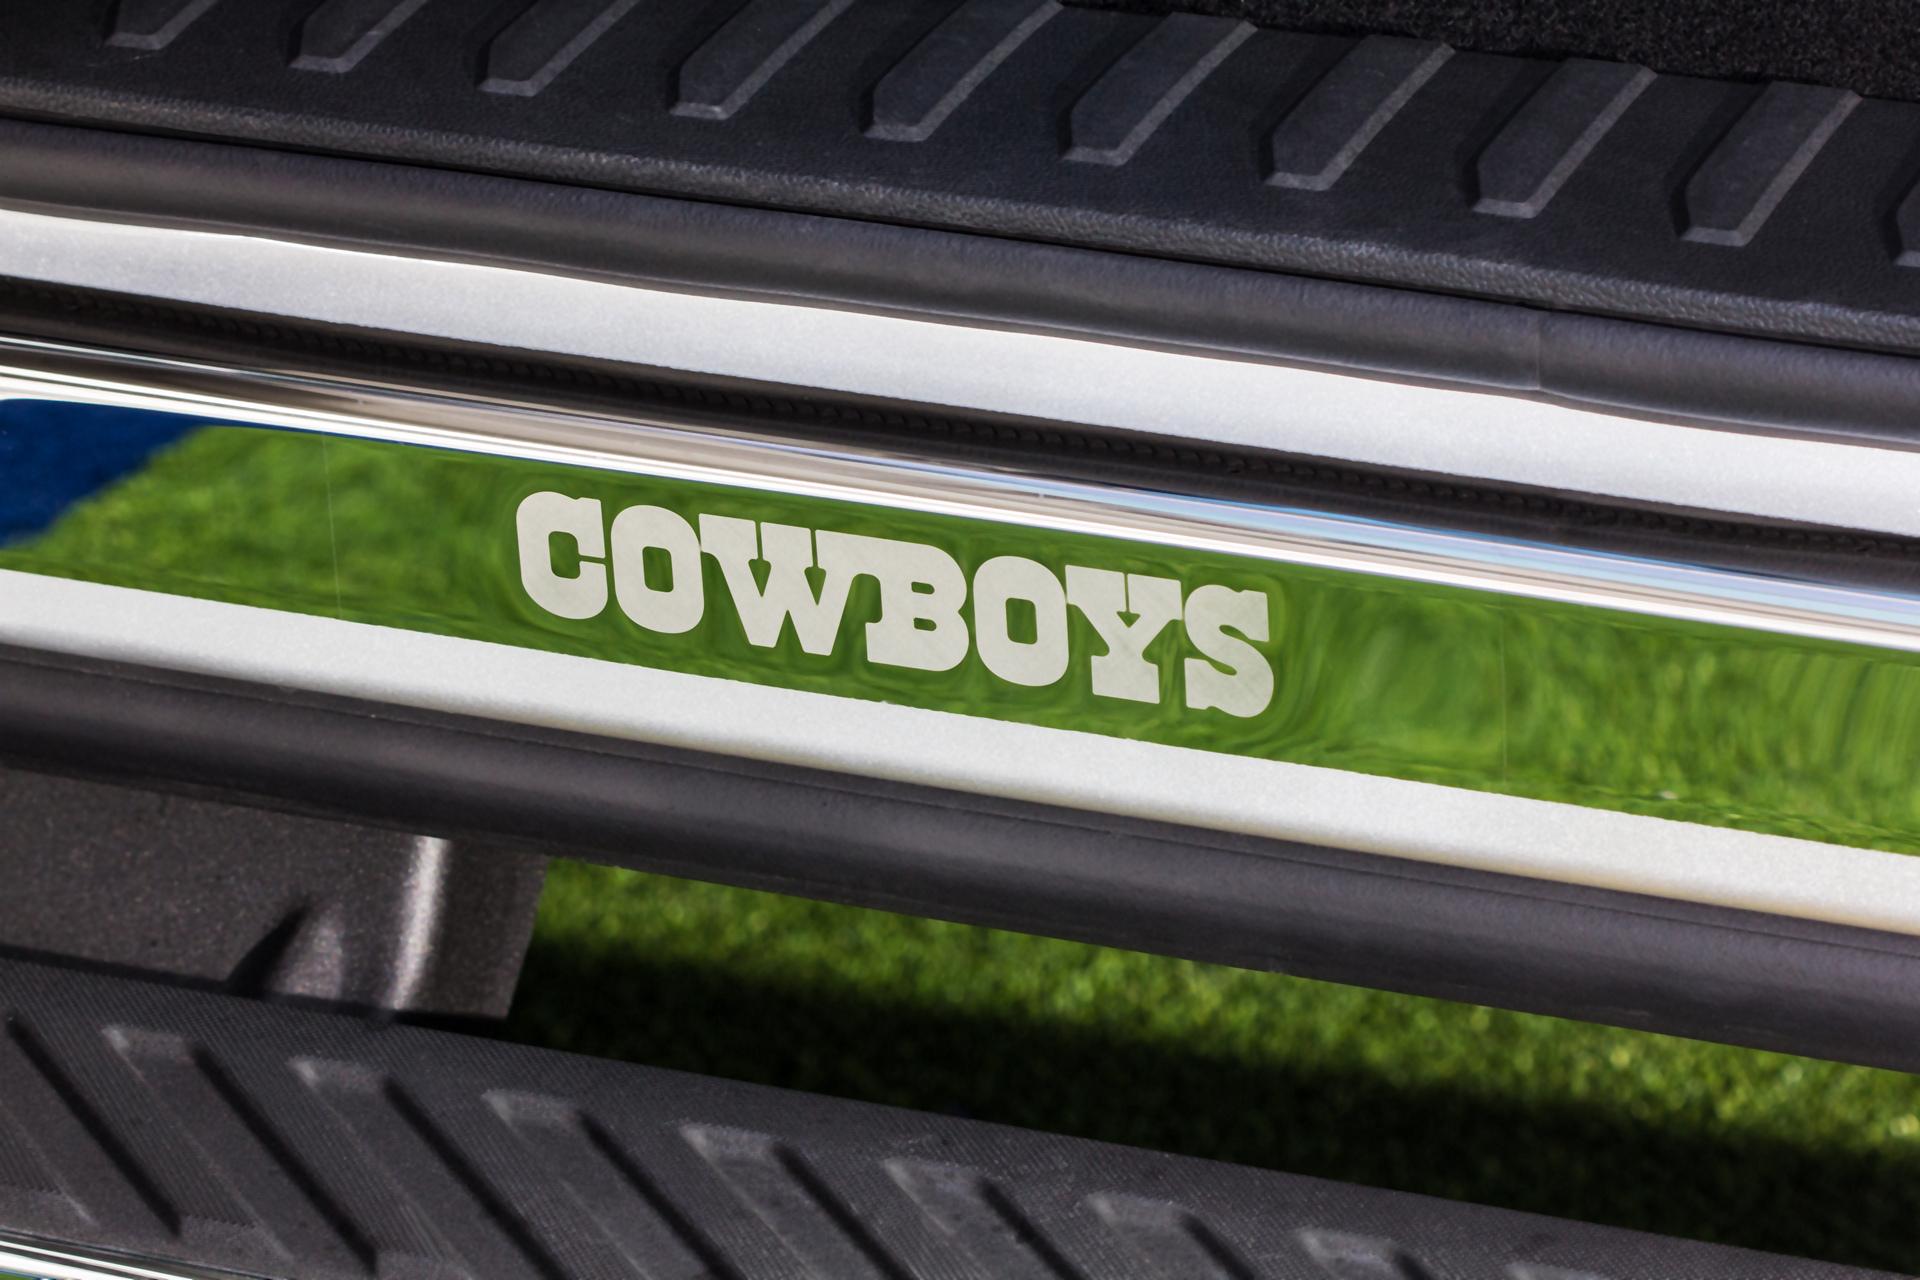 Ford F-150 Dallas Cowboys Edition © Ford Motor Company